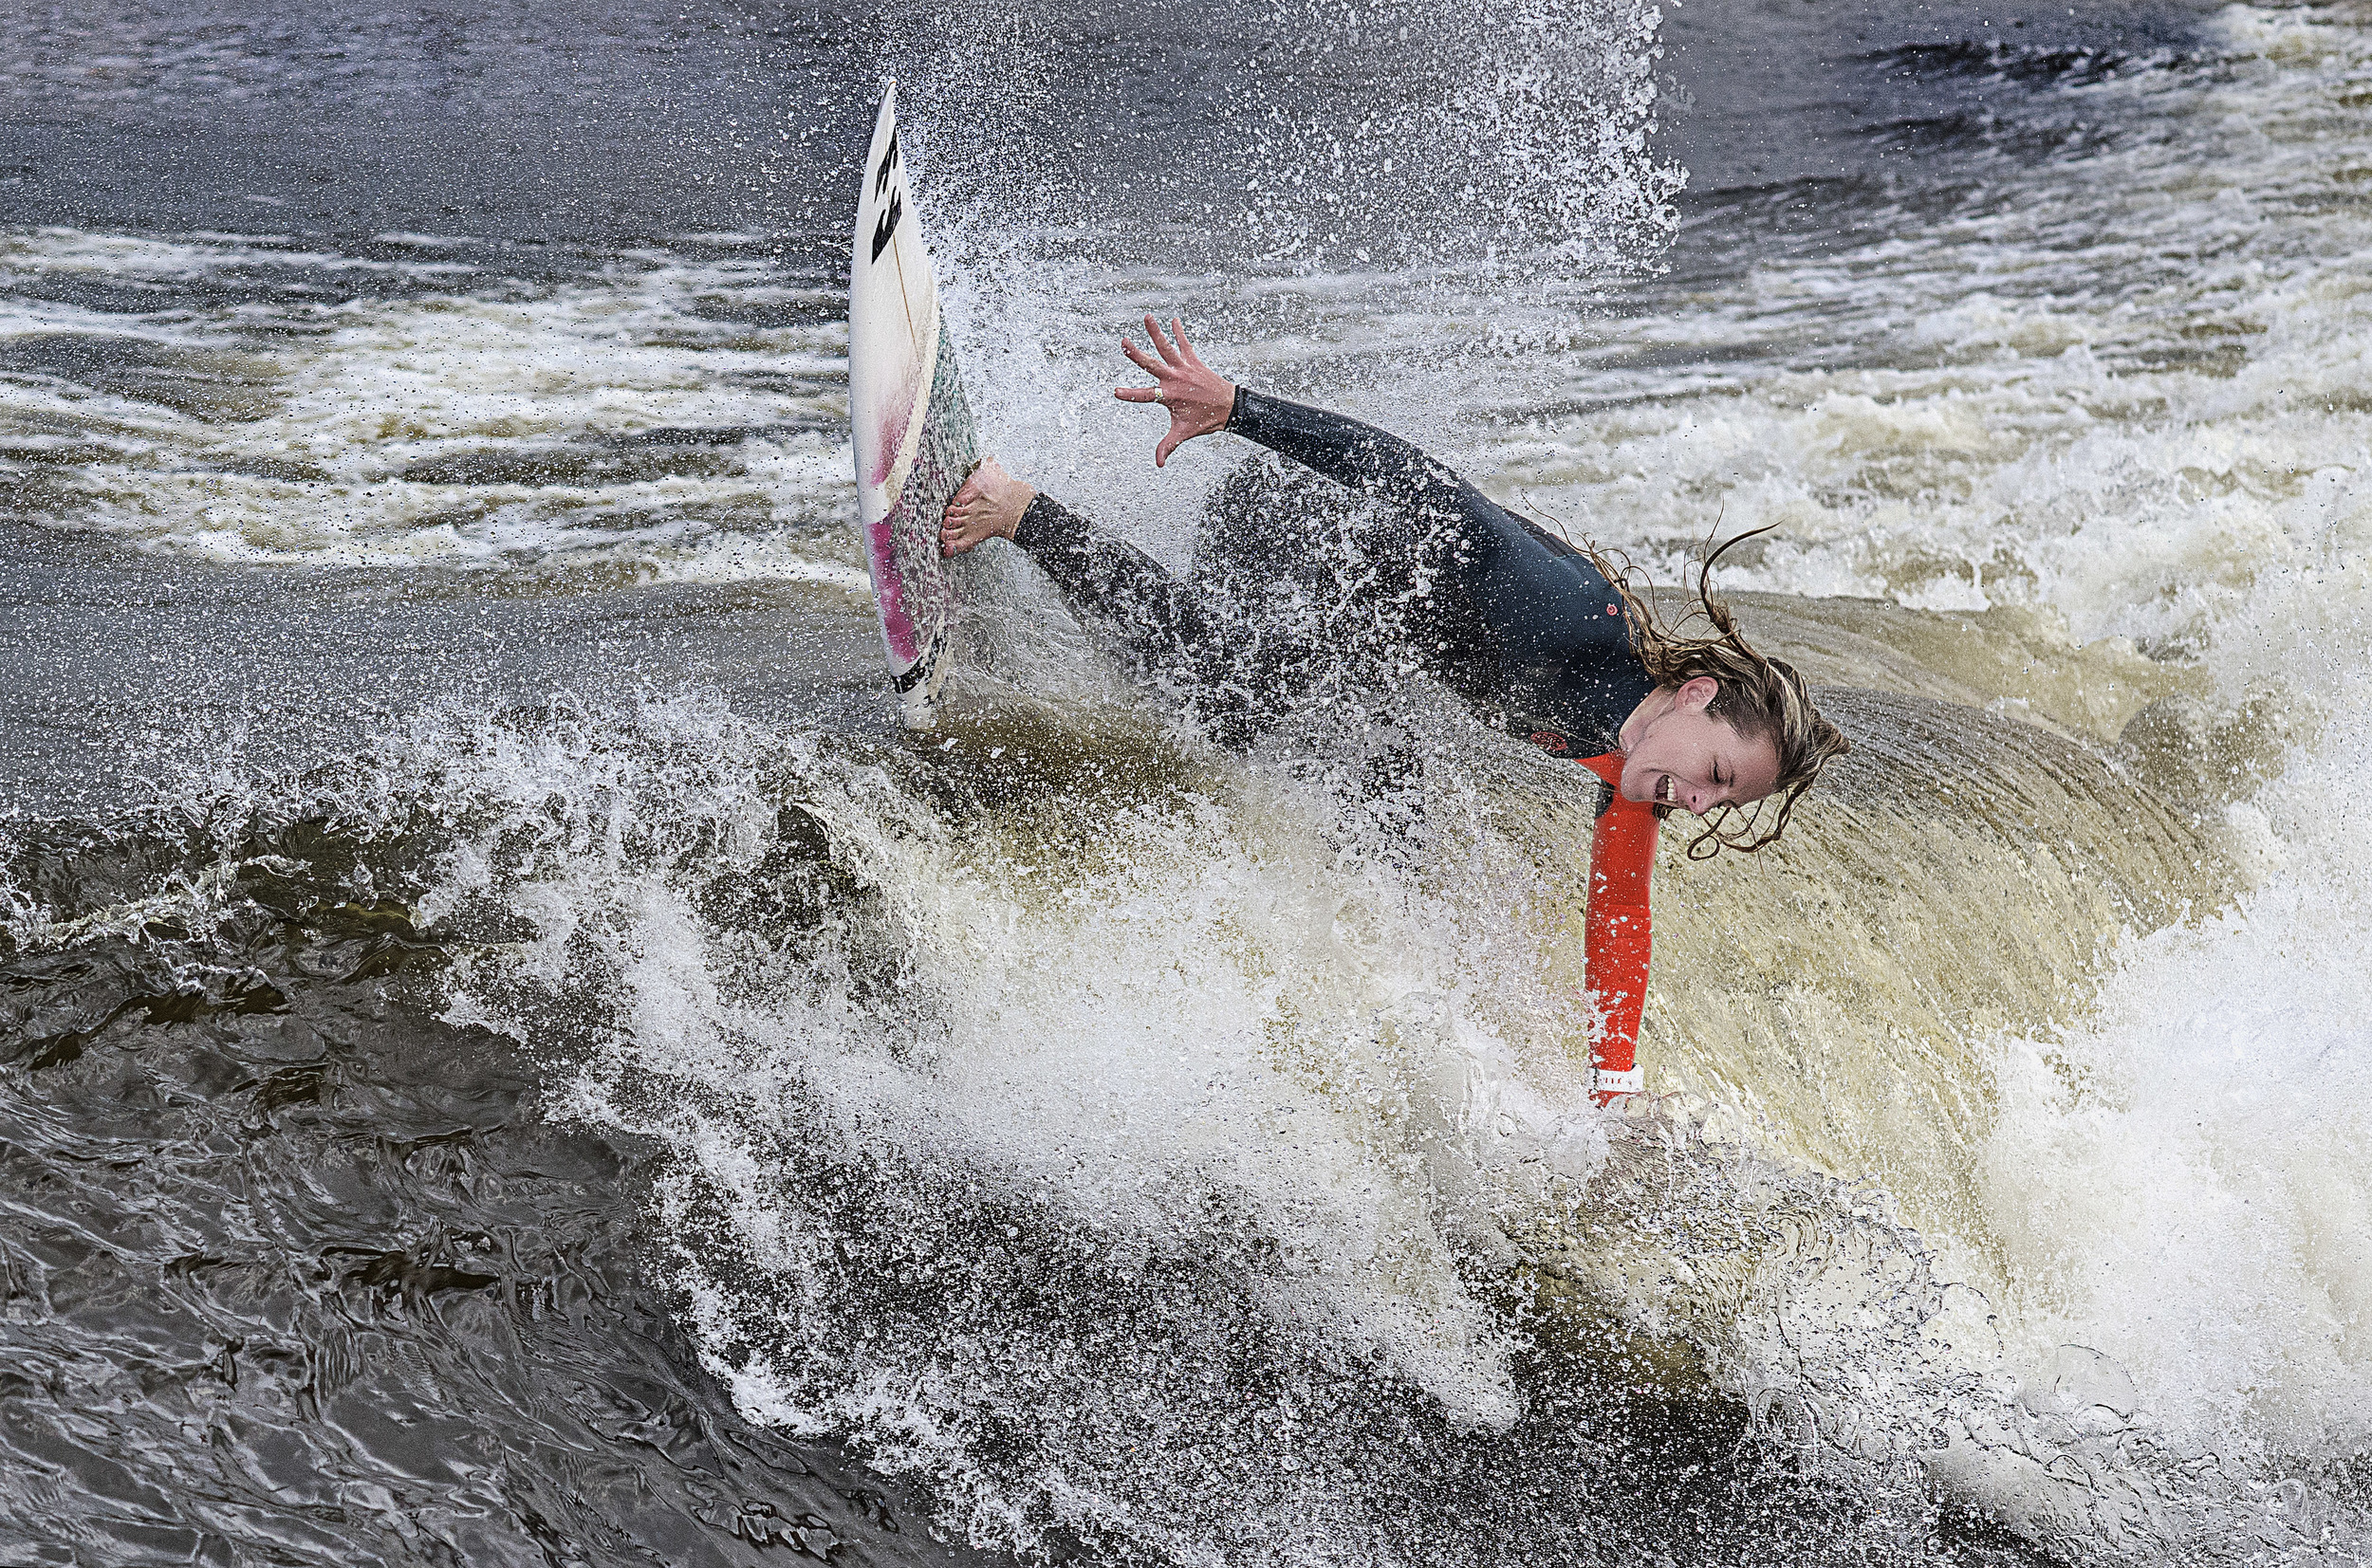 JO DENNISON AT SURF SNOWDONIA